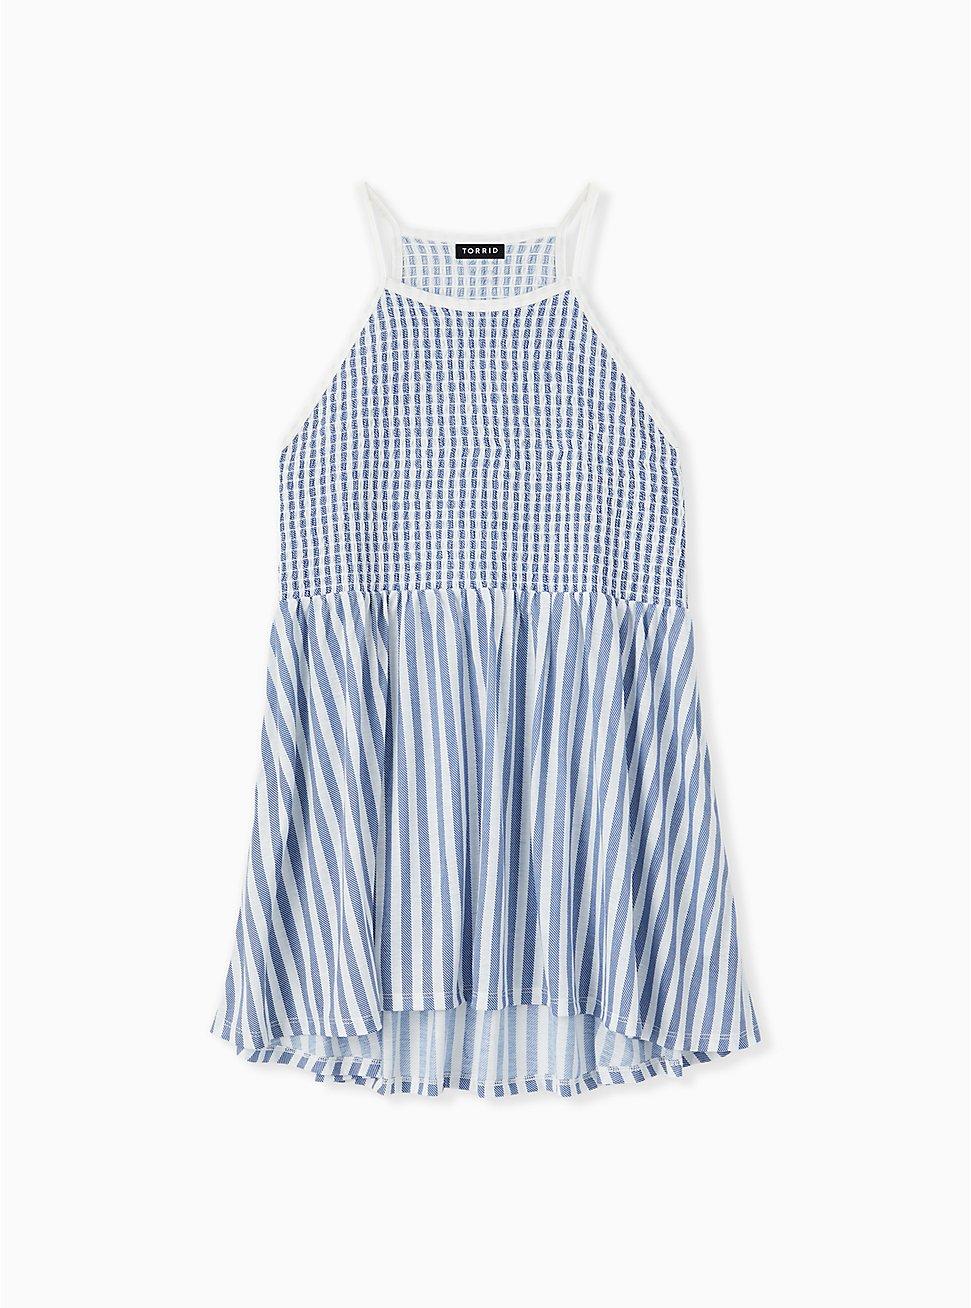 Blue & White Stripe Jersey Smocked High Neck Babydoll Top , STRIPE - MULTI, hi-res